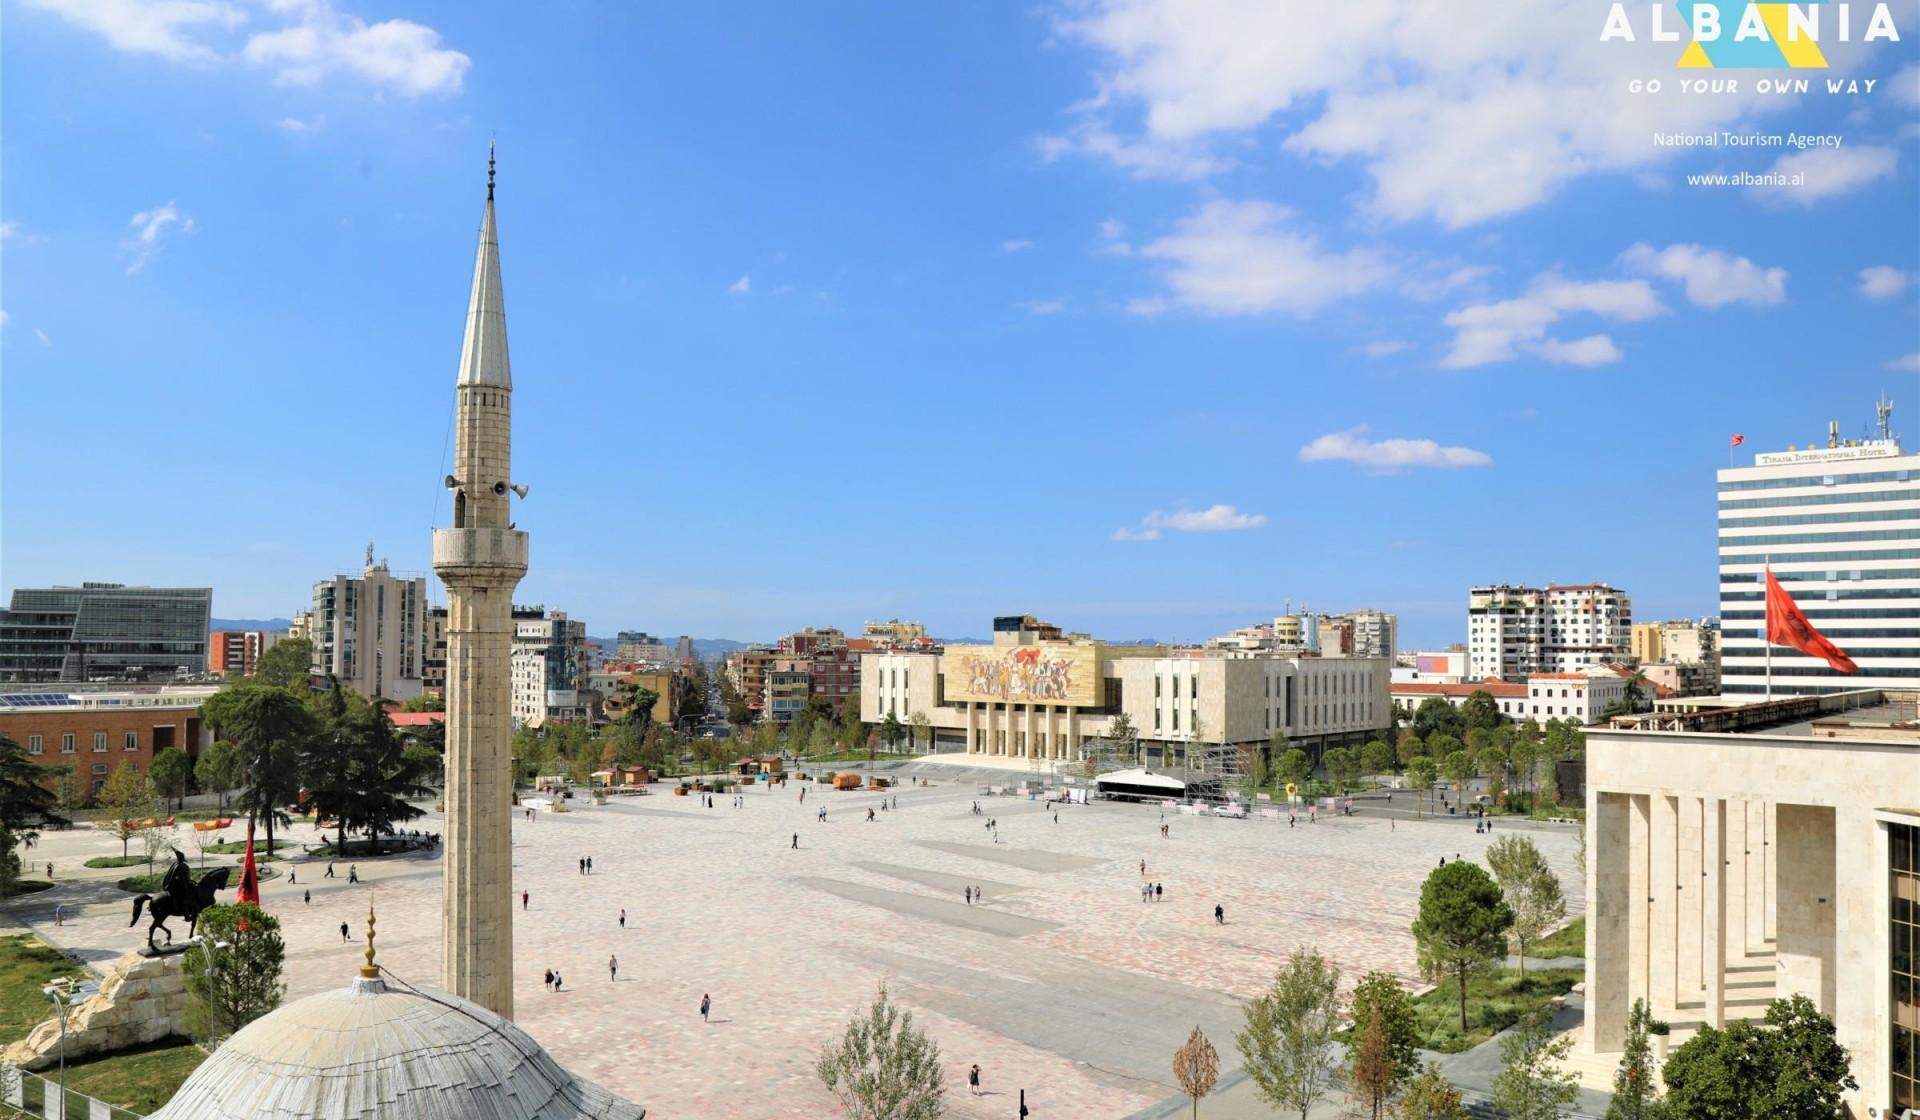 019 8hq4itk85b18ed588ce89 2400 1400 C 75 Essay Example Tourism In Unbelievable Albania 1920